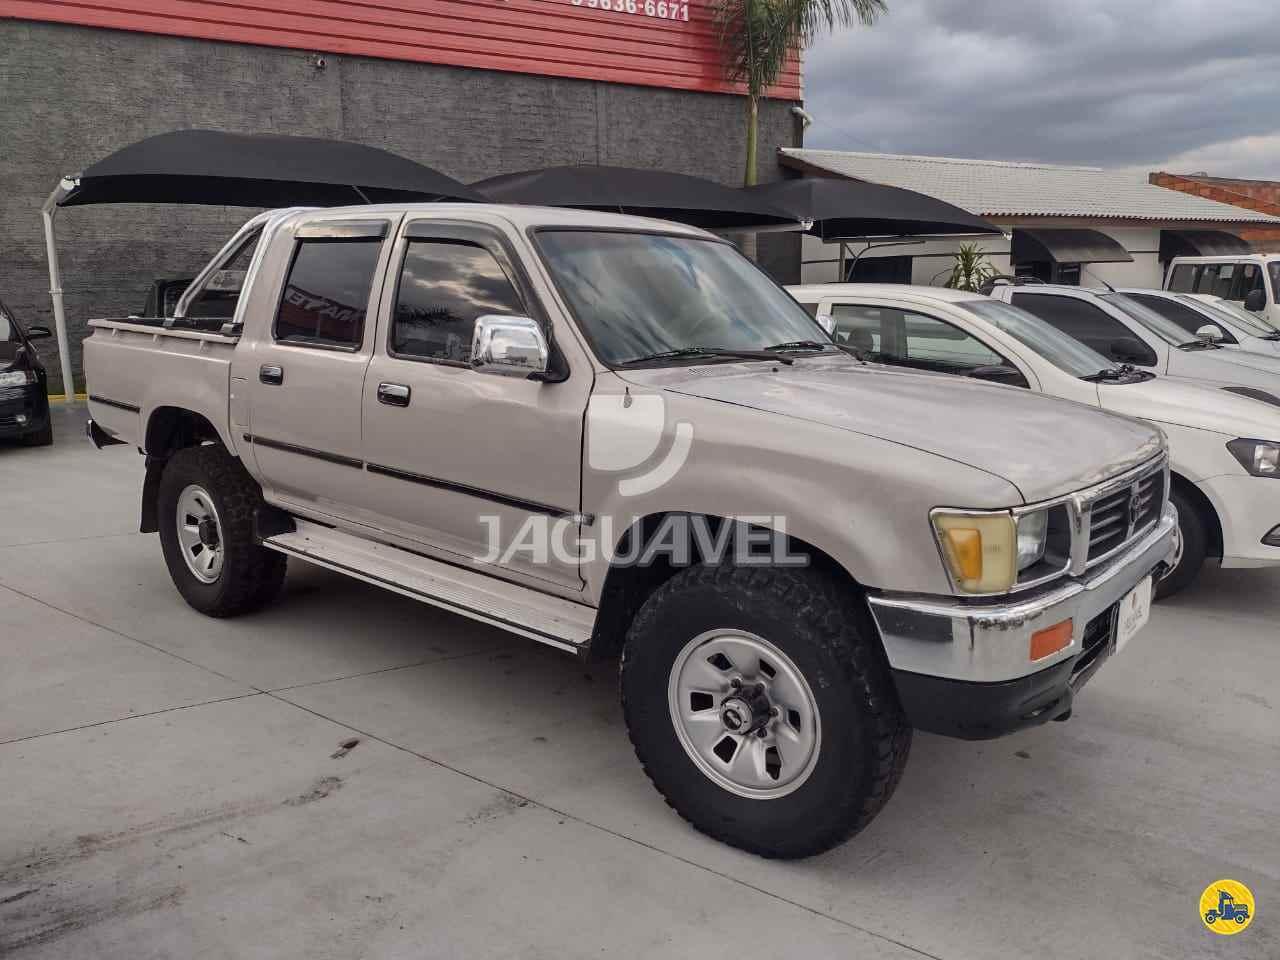 CARRO TOYOTA Hilux 2.8 SR5 Jaguavel Caminhões JAGUARIAIVA PARANÁ PR